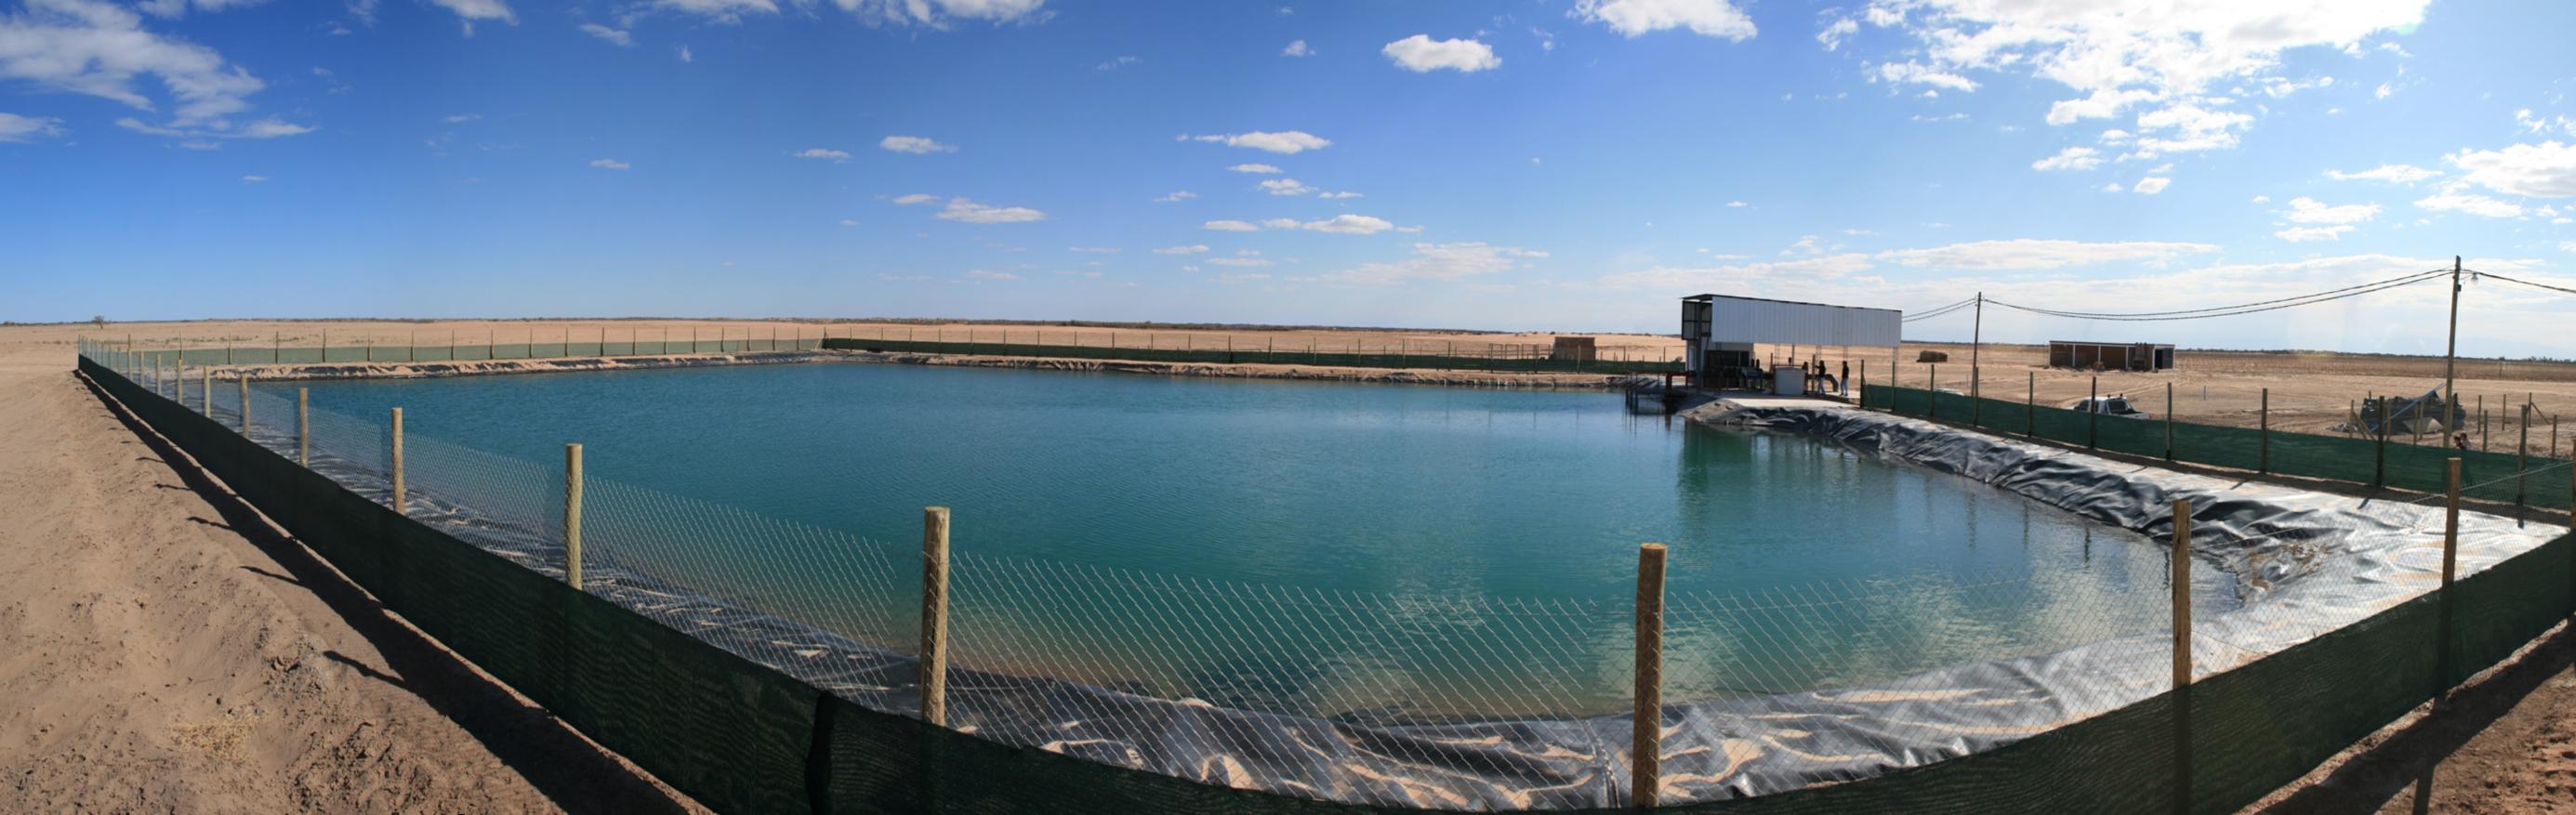 File reservorio de agua para riego en 25 de mayo san juan for Impermeabilizante para estanques de agua